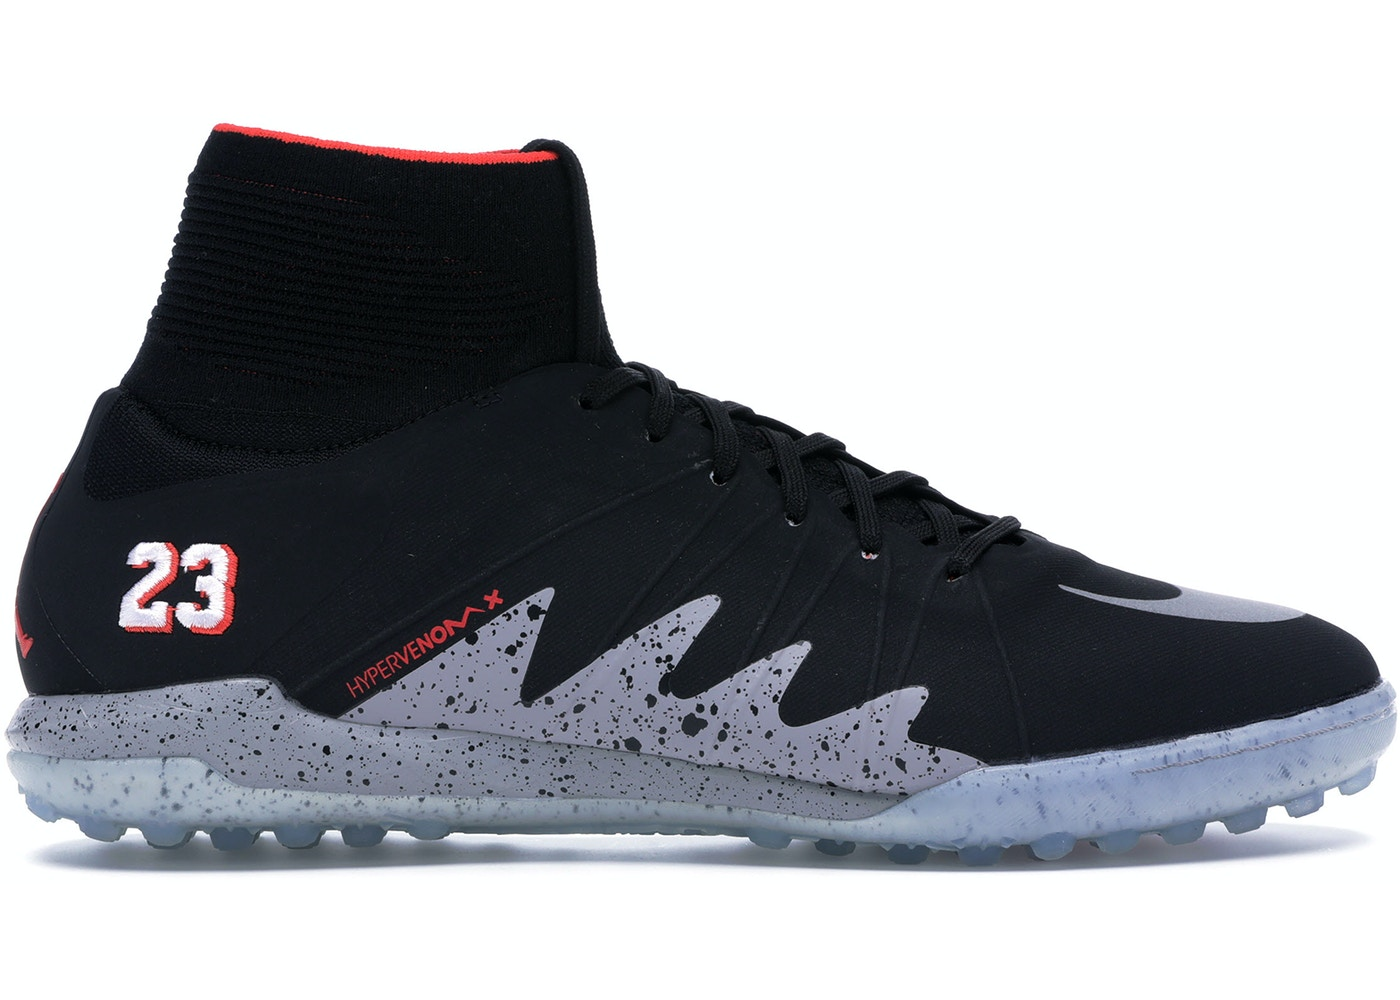 competitive price 208a1 4471f Nike Hypervenomx Proximo NJR TF Neymar x Jordan